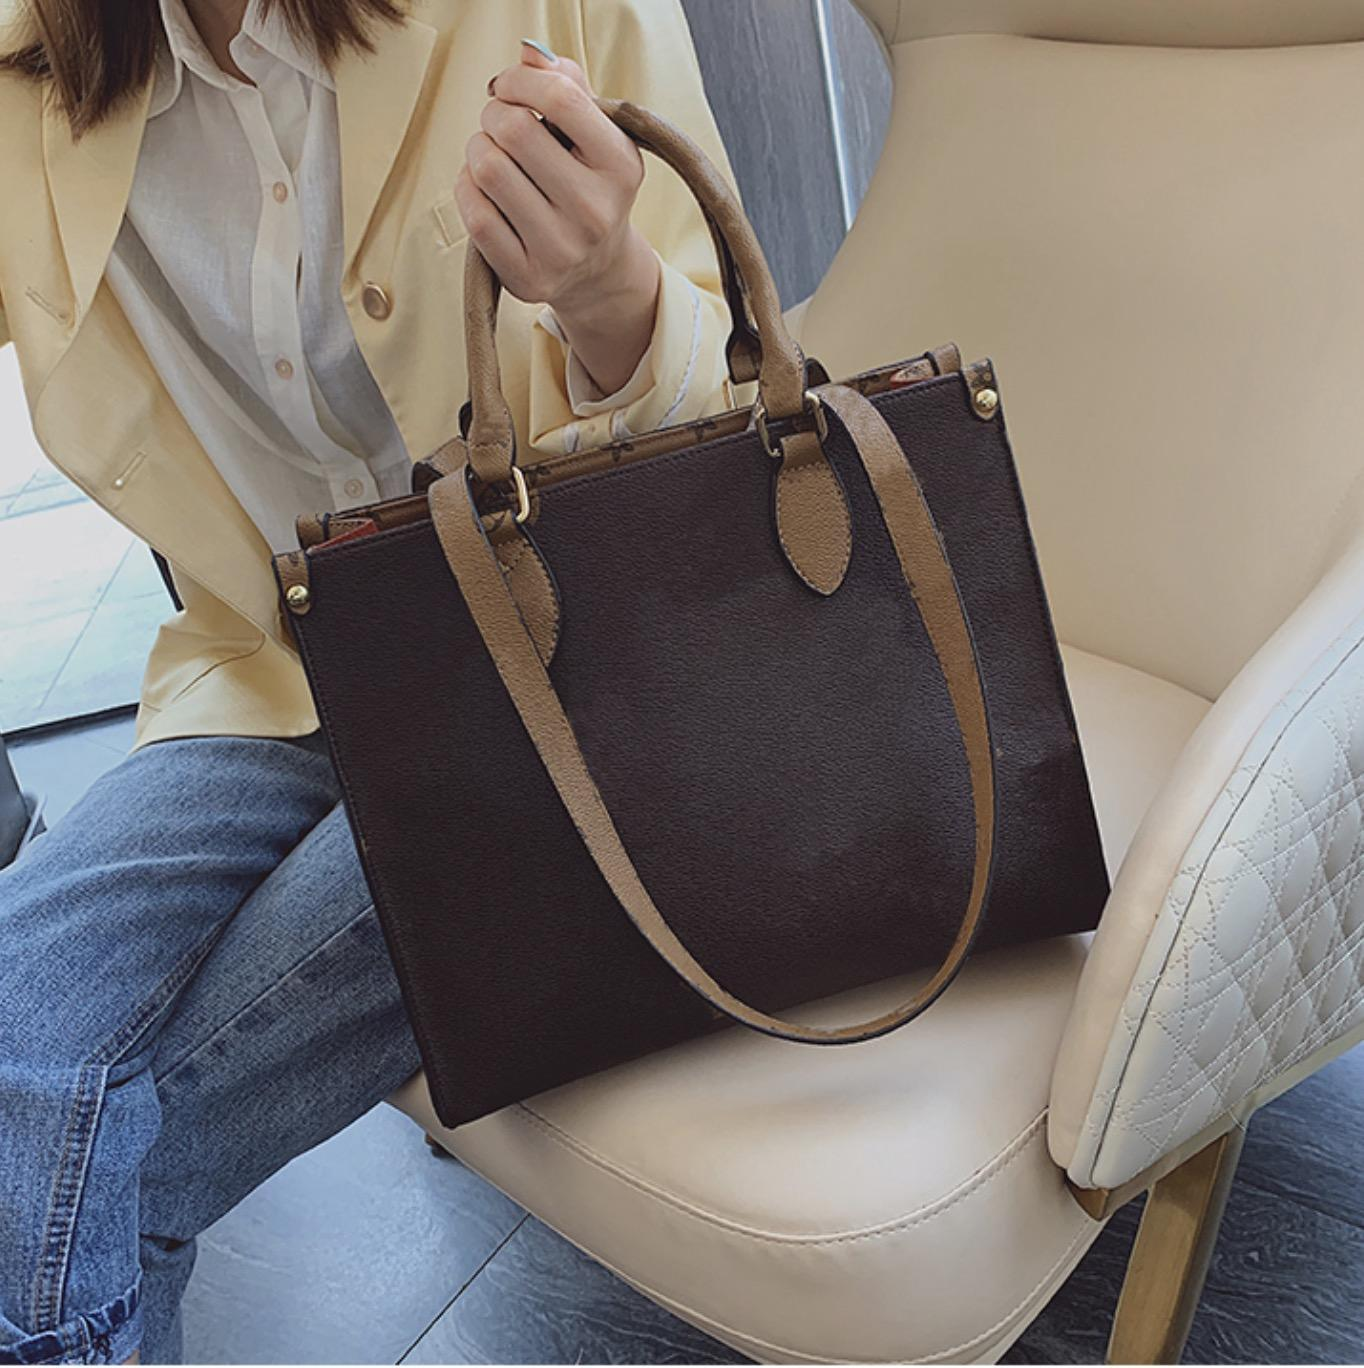 HH luxurys famous designer Handbags shopper tote shopper shoulder handbag bag bags purses women ladies crossbody wallets